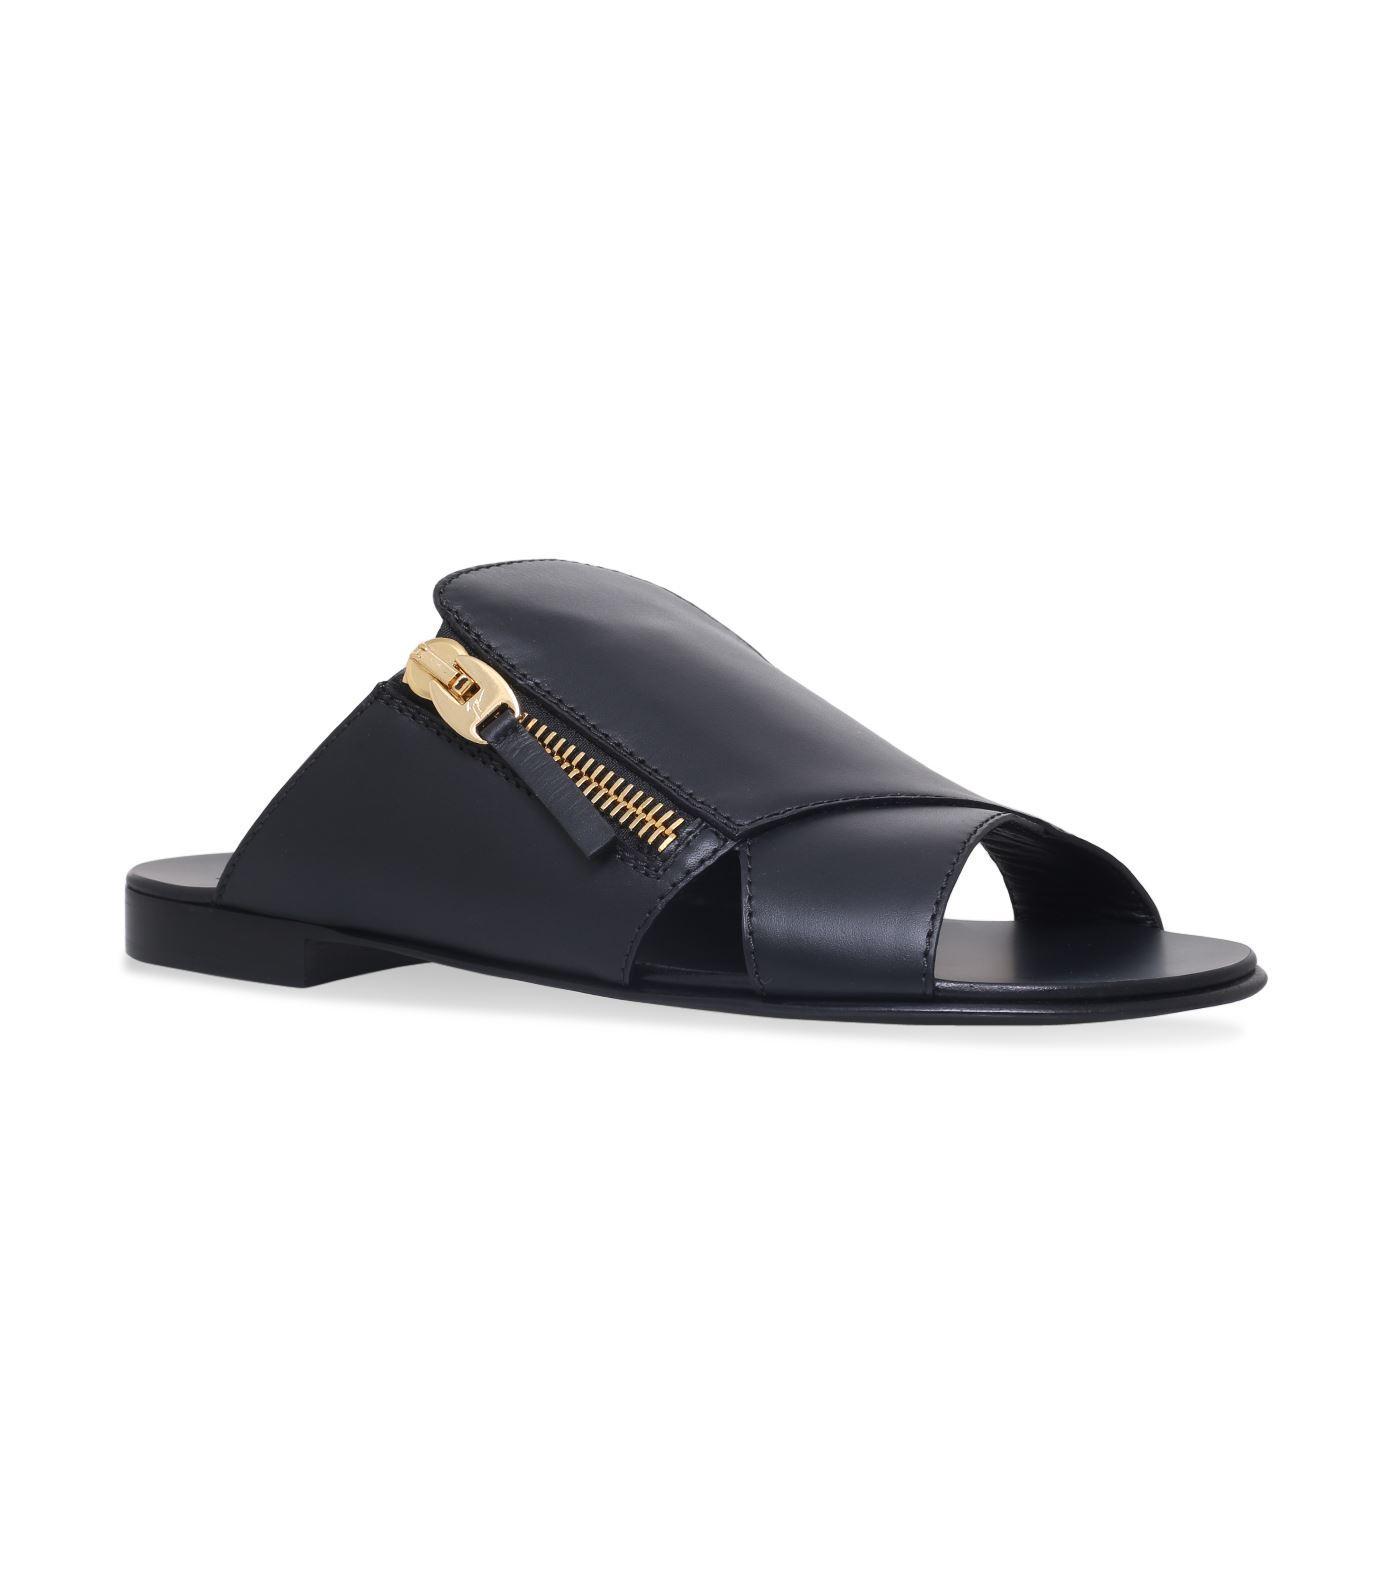 Giuseppe Zanotti Zip Trim Sandals In Black